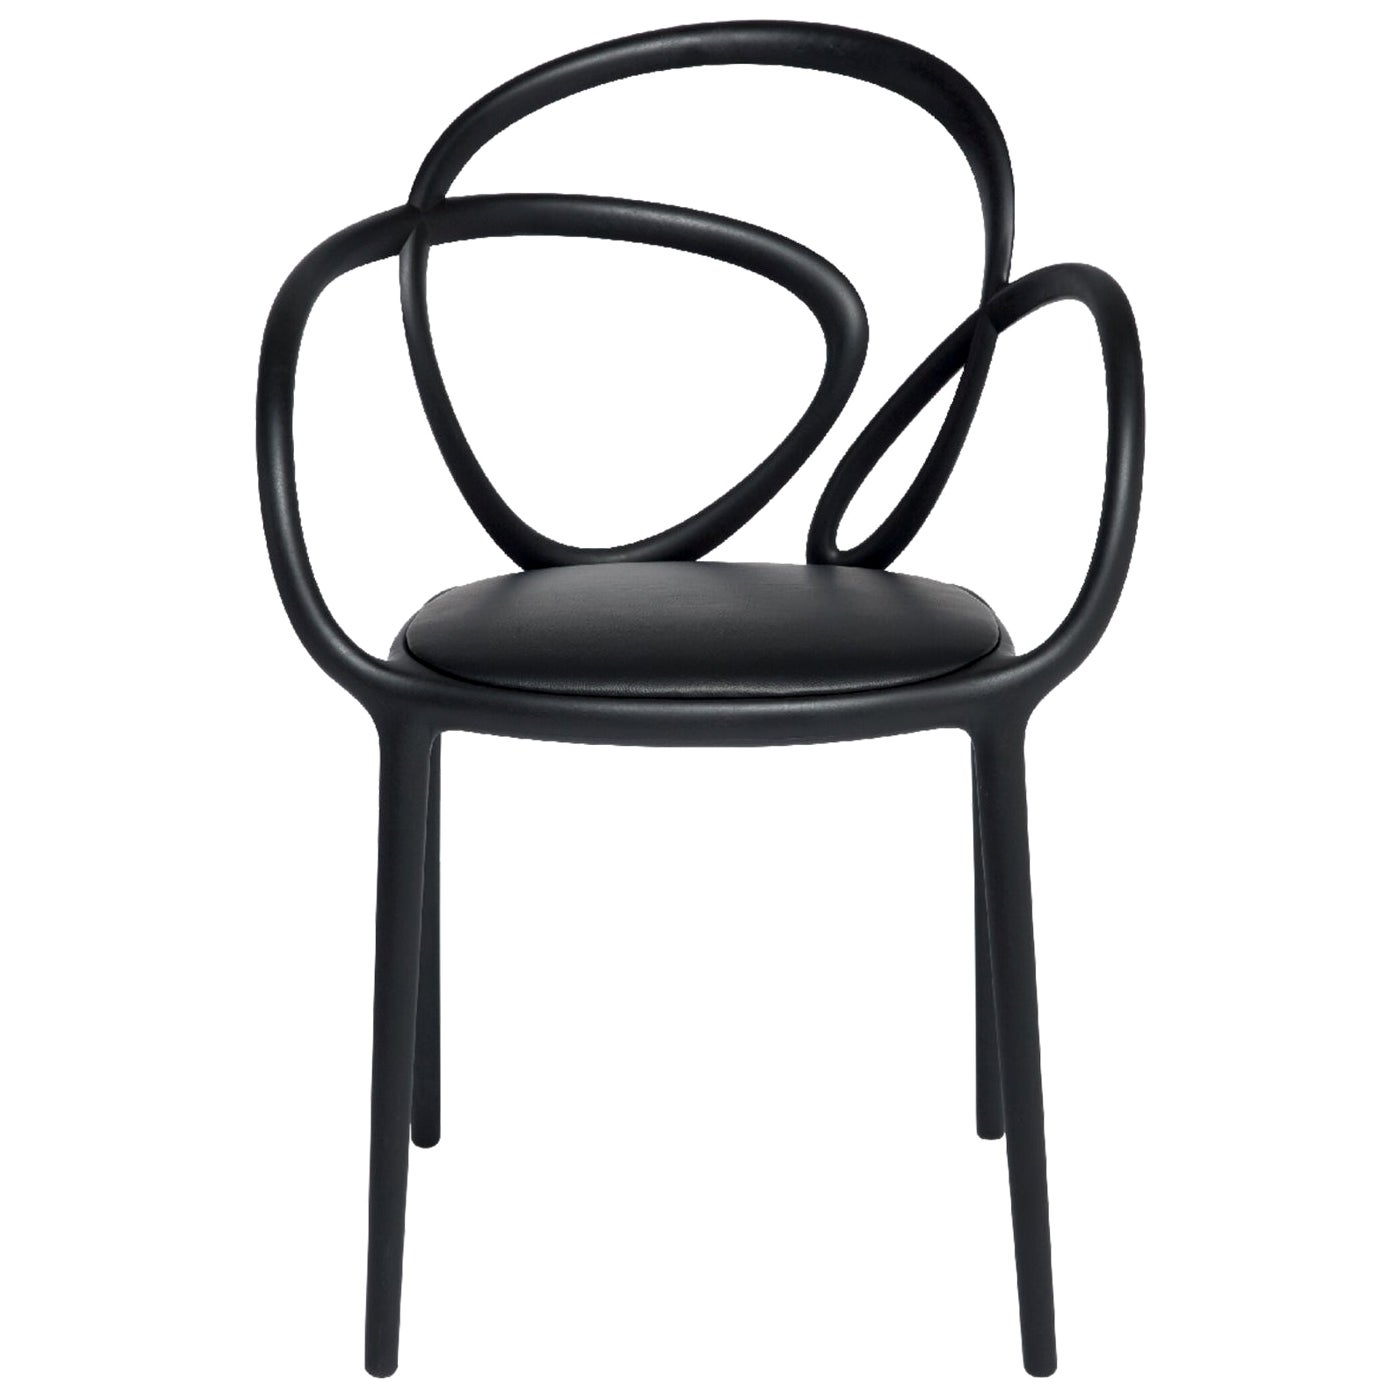 Black Loop Padded Armchair, Made in Italy